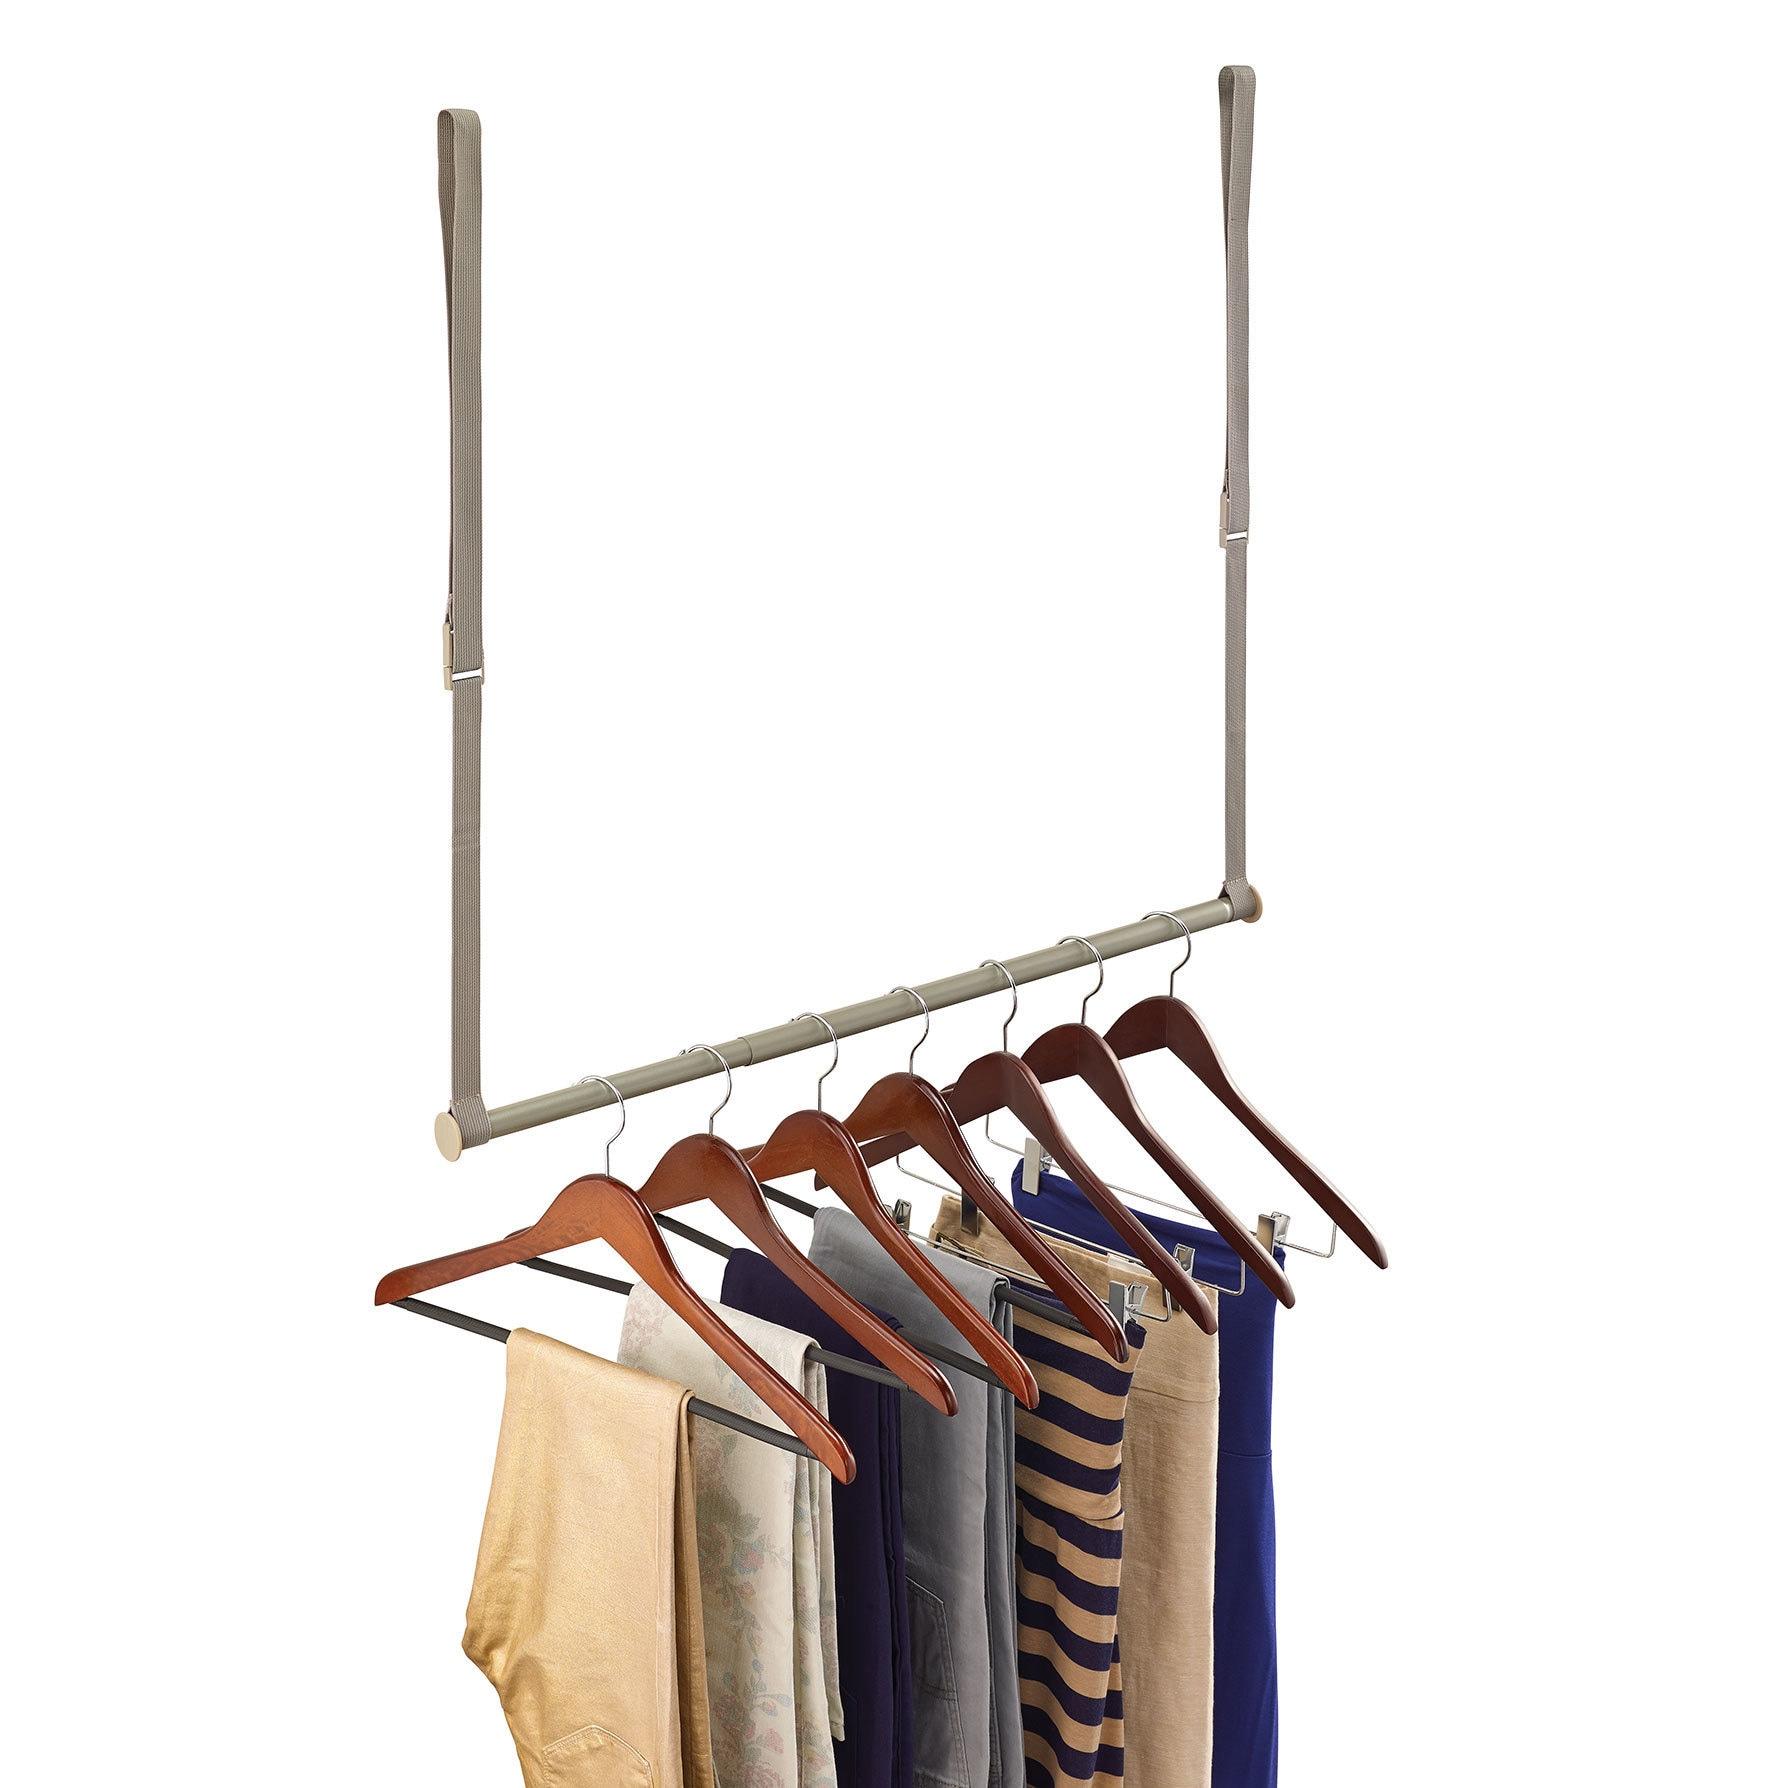 Closetmaid Nickel Double Hang Closet Rod